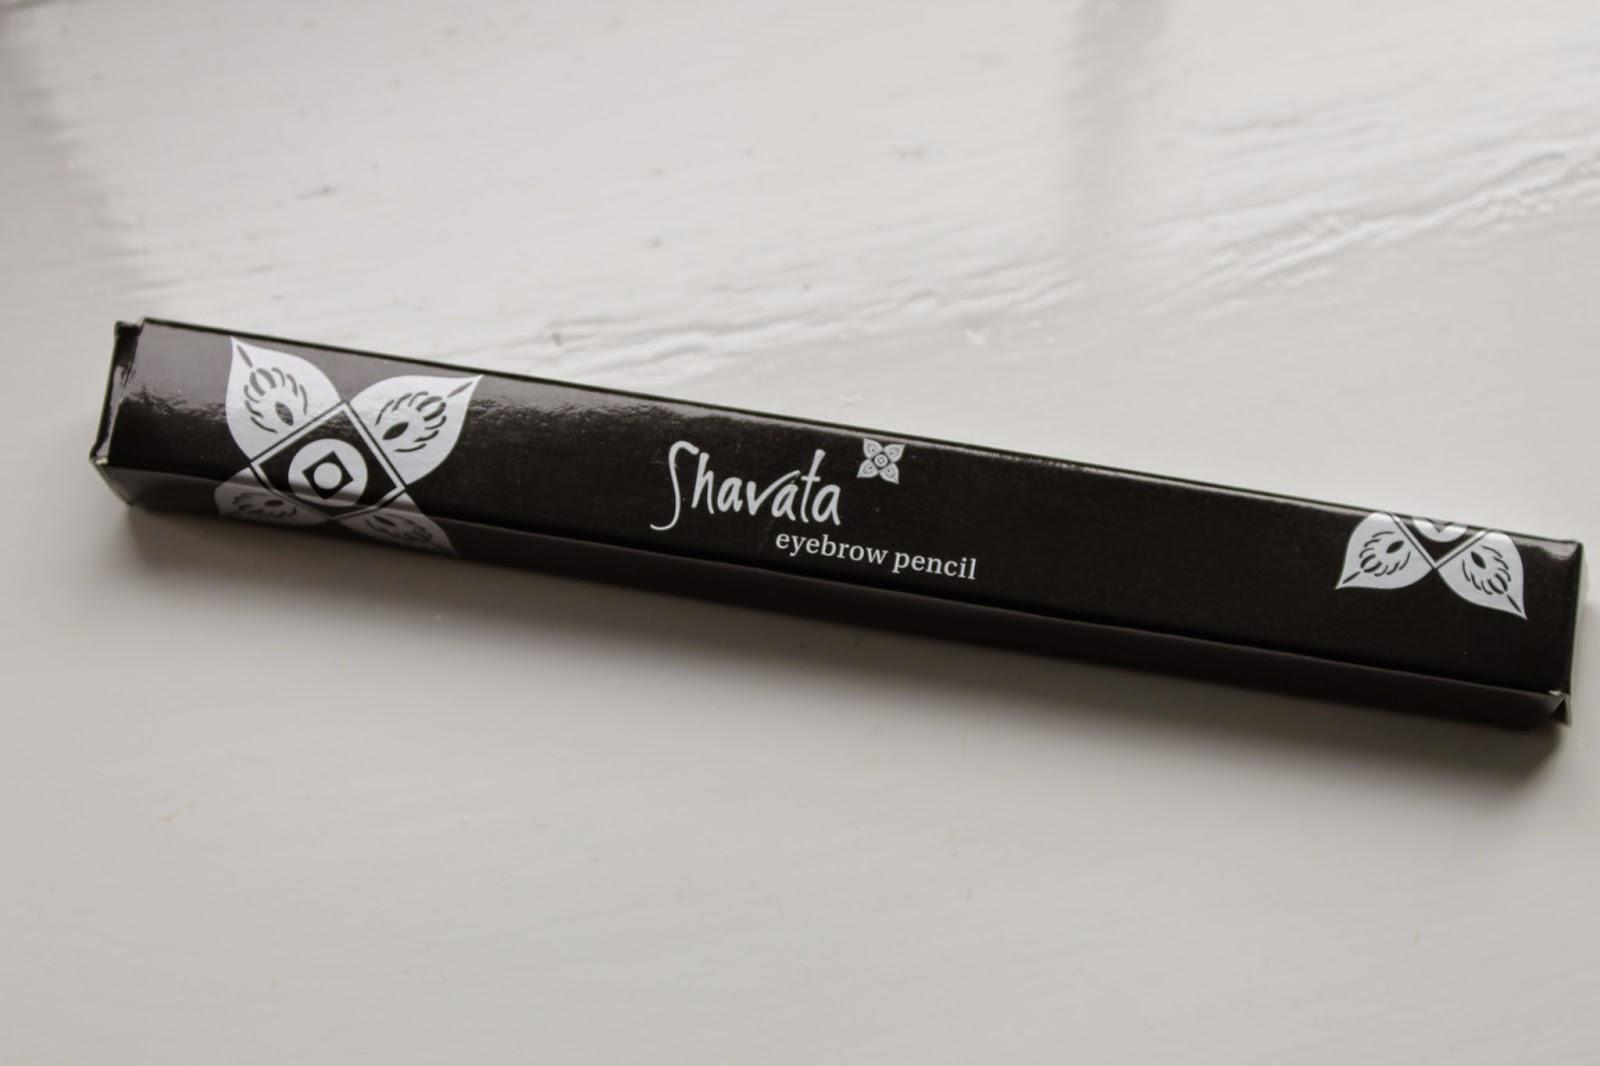 Shavata Double-Ended Eyebrow Pencil